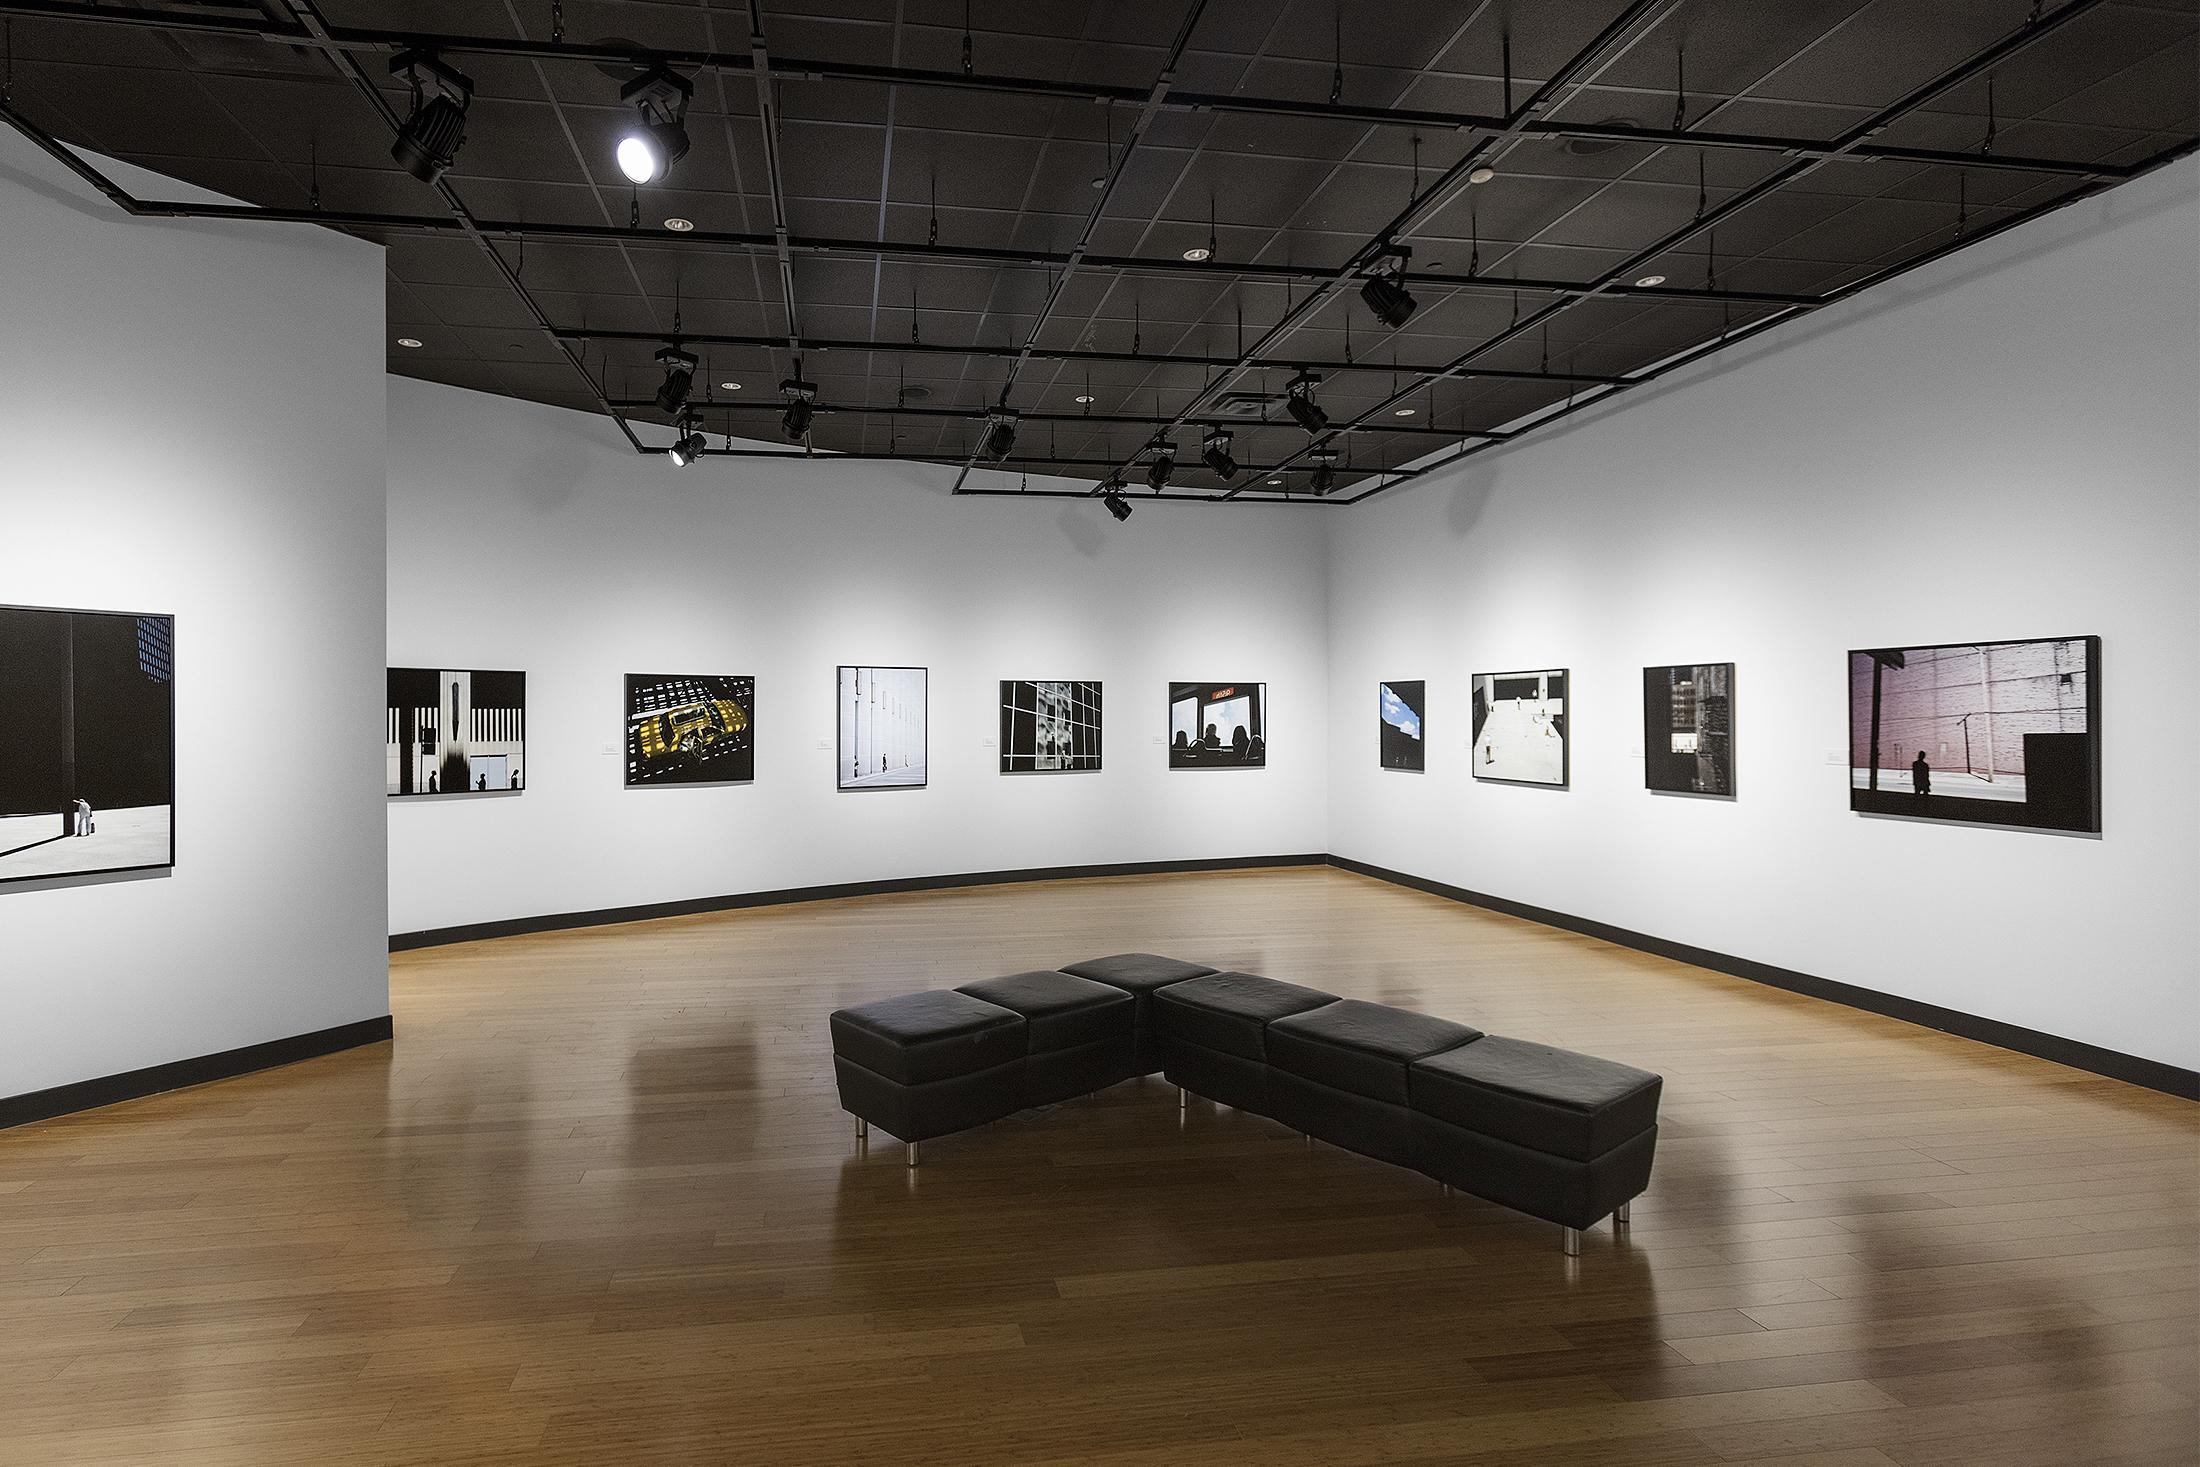 Clarissa Bonet_Urban Constructs_Southeast Museum 2019_02.jpg